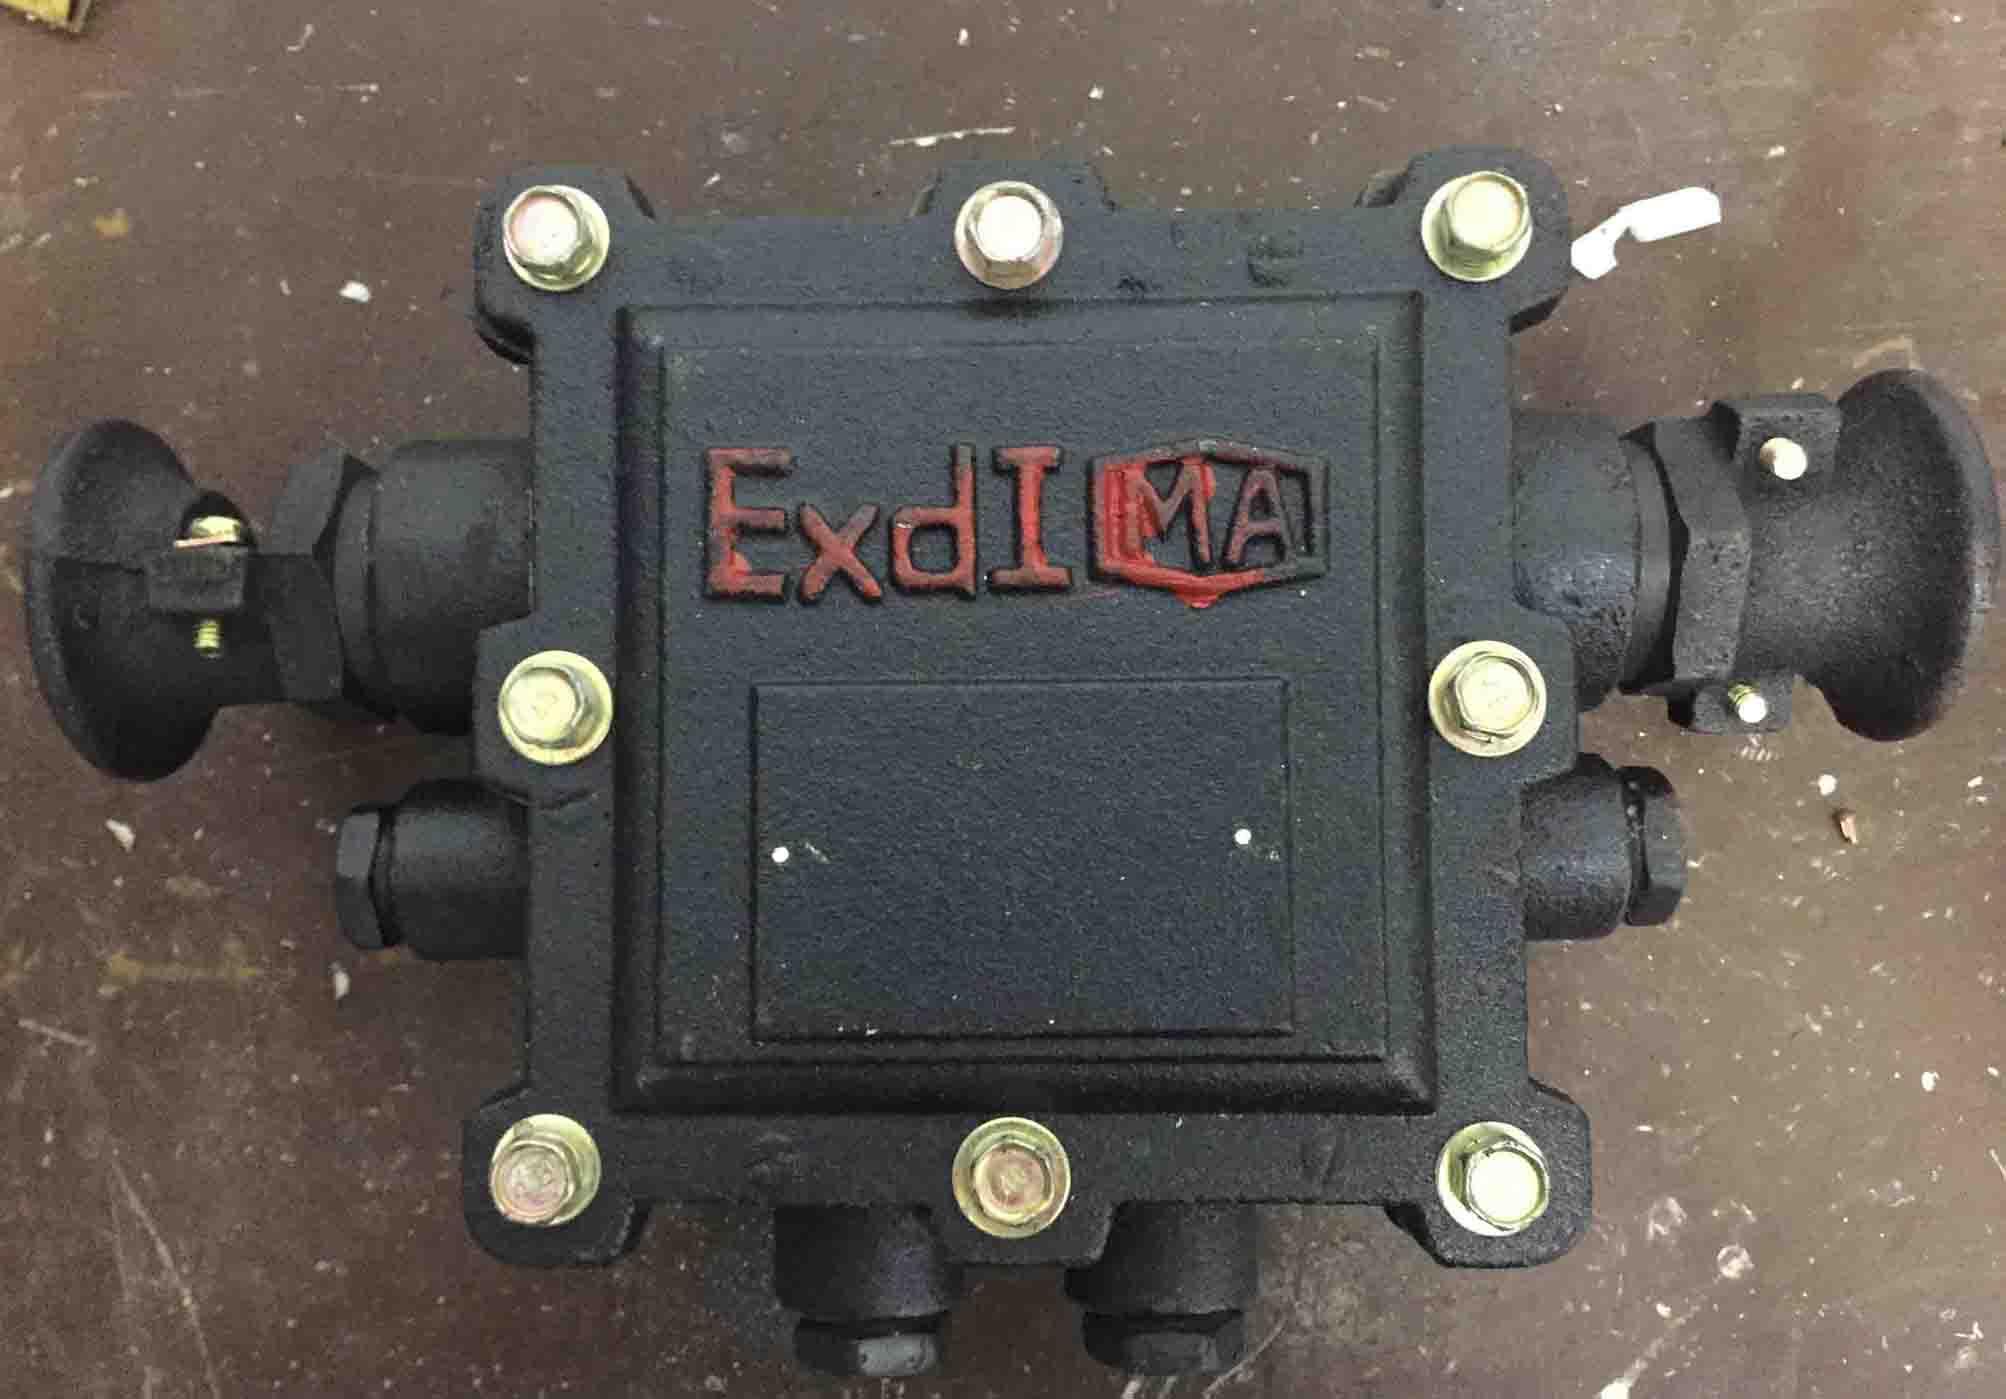 BHD2-20/127-6T 一、BHD2-20 127-6T防爆接线盒使用范围 本系列矿用隔瀑型低压电缆接线盒适用于含有爆炸性气体(甲烷)混合物的煤矿井下供电系统中,供信号、照明、动力设备等作电缆连接和分支之用。 二、BHD2-20 127-6T防爆接线盒适用途 1、隔爆壳体及盖由高强度HT250铸铁制成,二者以平面隔爆接合面或圆筒隔爆接合面仅400A)通过螺栓等紧固件连接; 2、接线座体采用上釉陶瓷烧结而成,绝缘性好,强度高,接线柱与绝缘座的连接采用环氧树脂灌封,牢固可靠,绝无松动。 接线盒由隔爆外壳